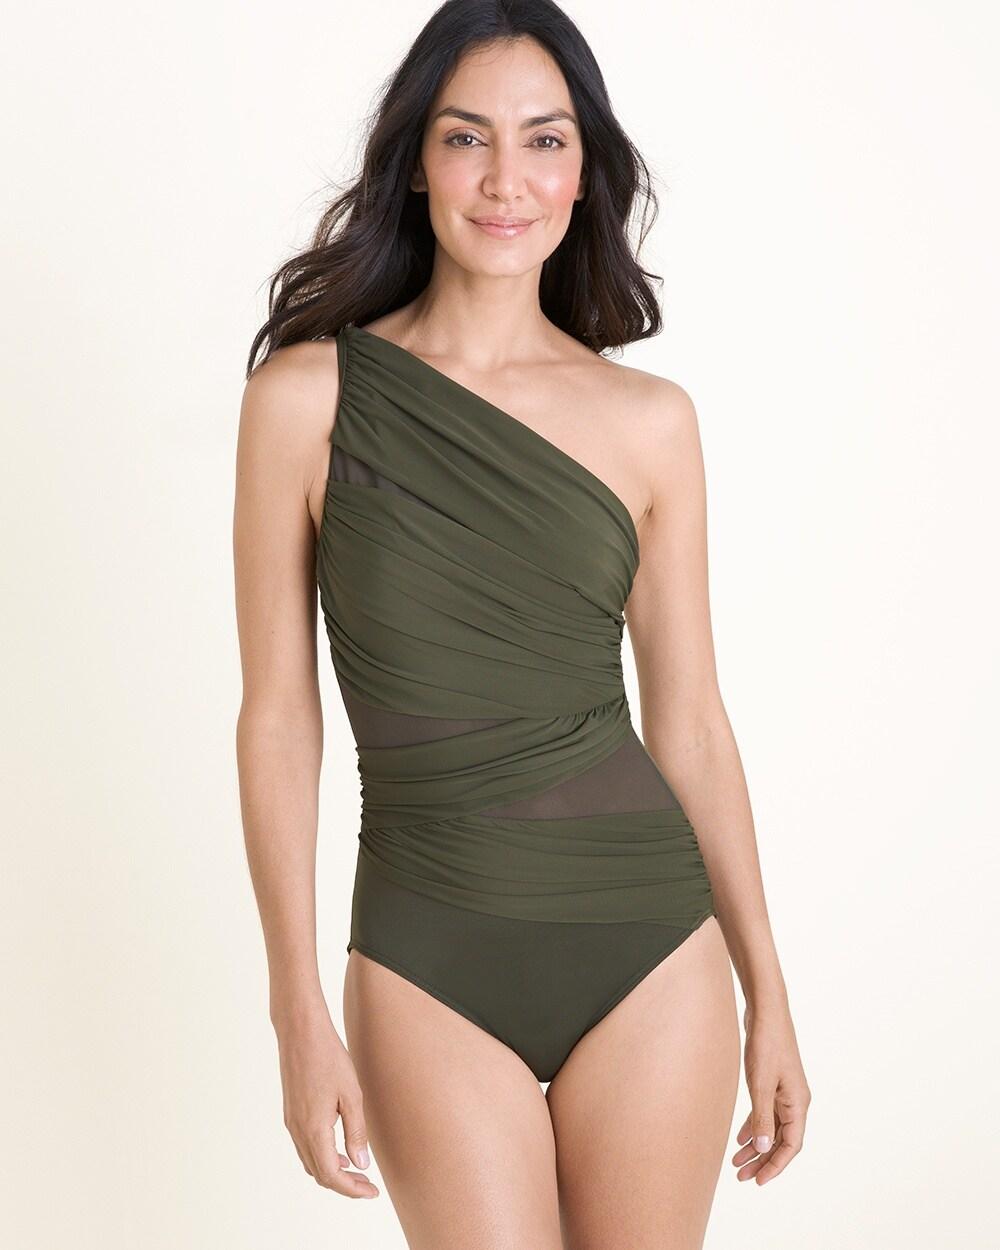 29faa362311 Network Jena One-Piece Swimsuit - Chico's